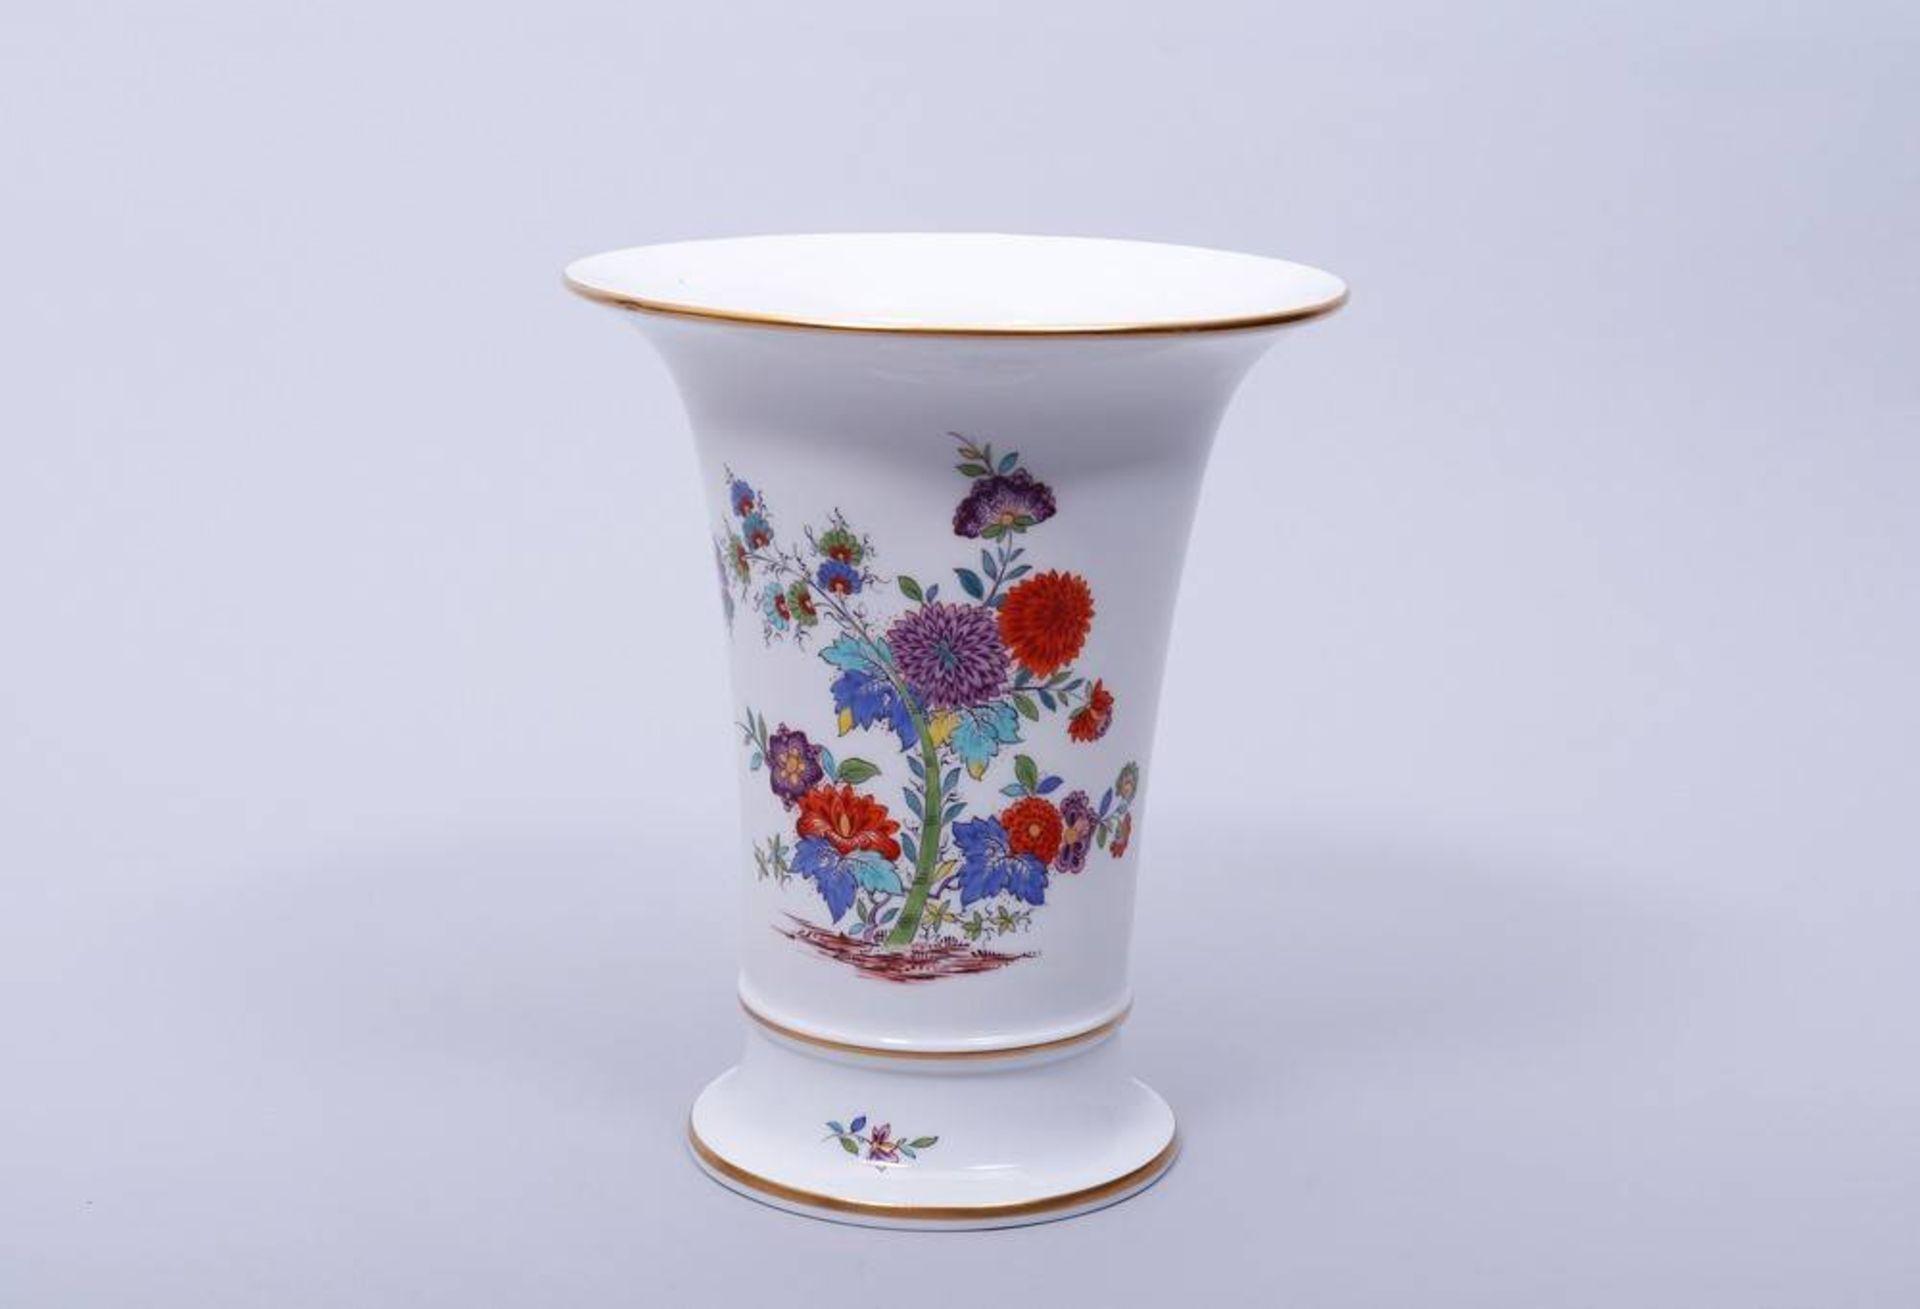 Vase, Meissen, Kakiemon-Dekor, 20. Jhdt.Porzellan, polychrom bemalt, goldstaffiert, Trompetenform,